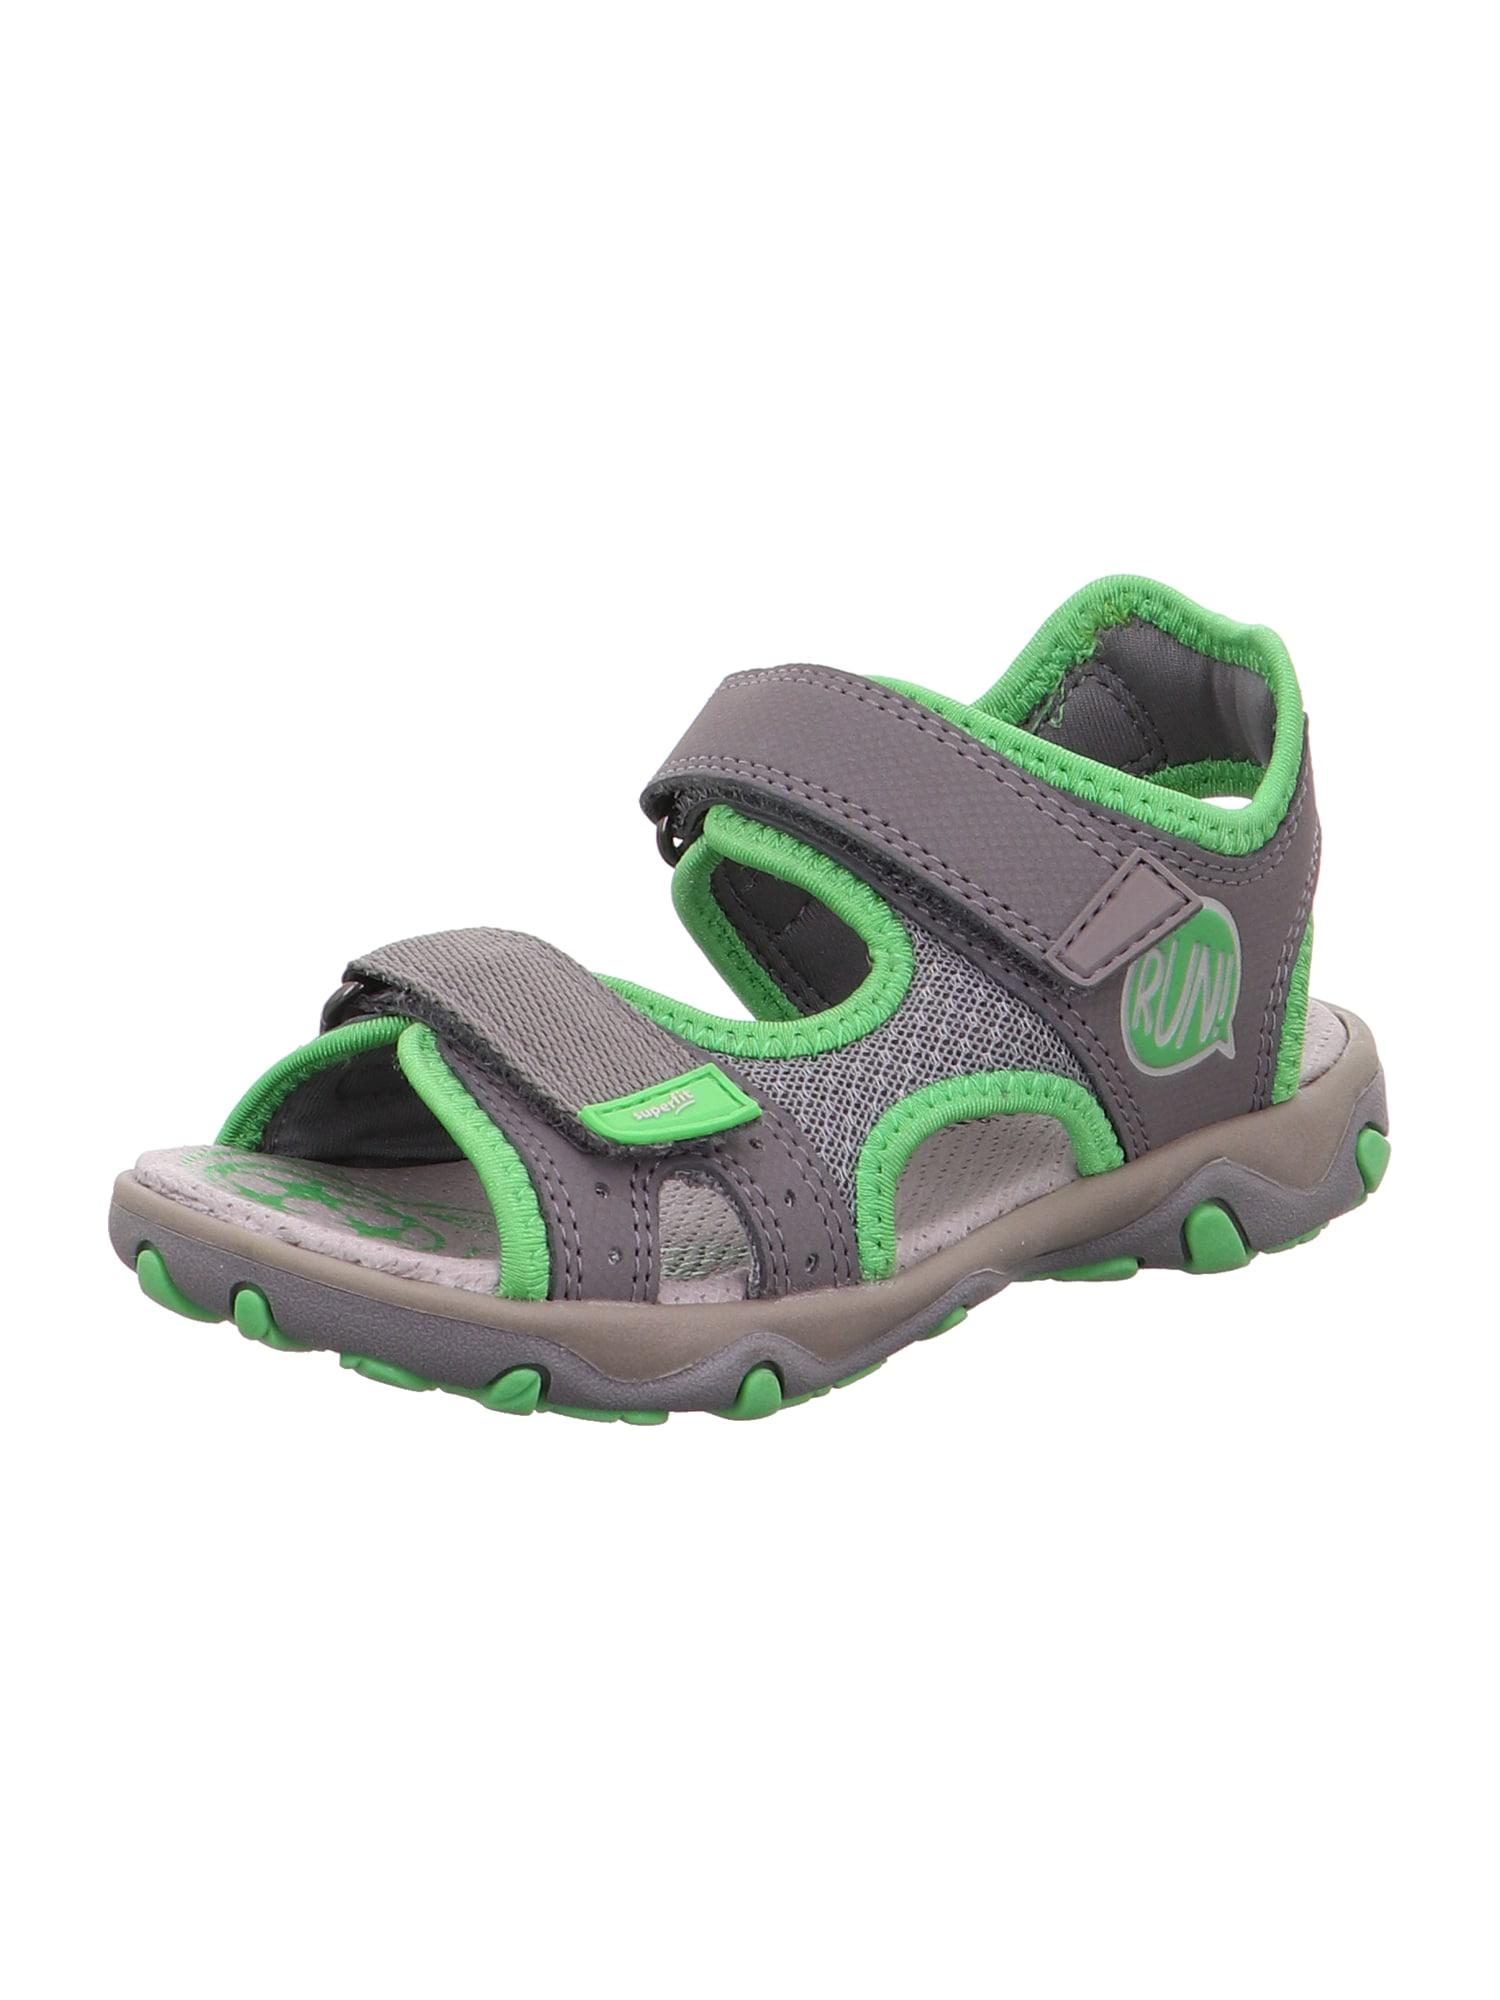 SUPERFIT Atviri batai 'MIKE 3.0' pilka / žolės žalia